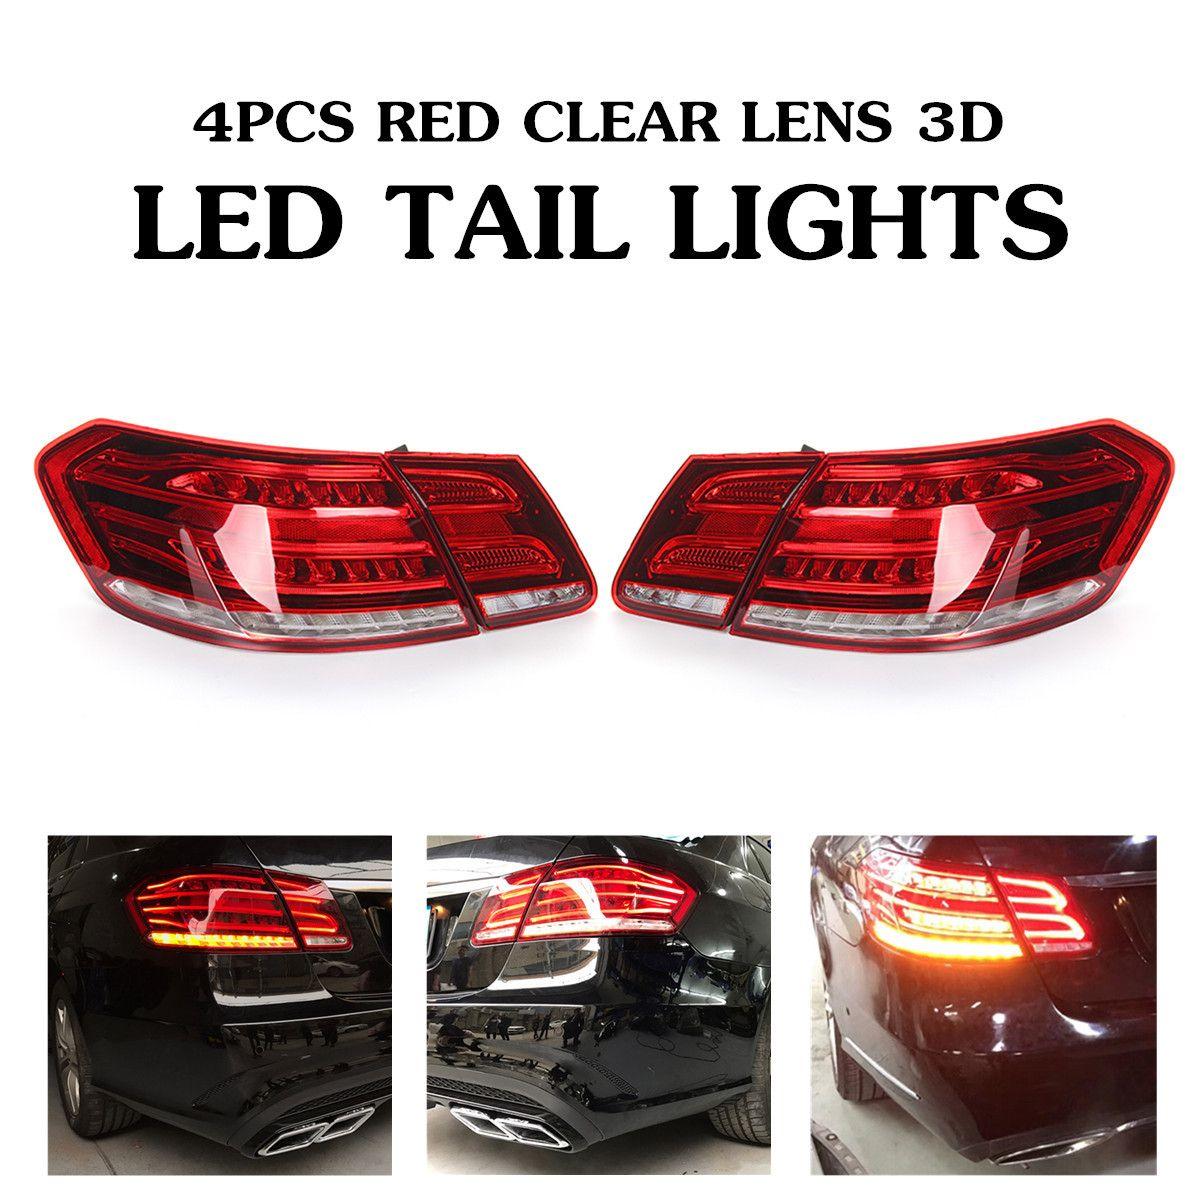 LED Tail Lights For Mercedes-Benz E Class W212 E350 E300 E250 E63 Sedan Lamps ABS Direct replacement Car Light Assembly 49x19cm